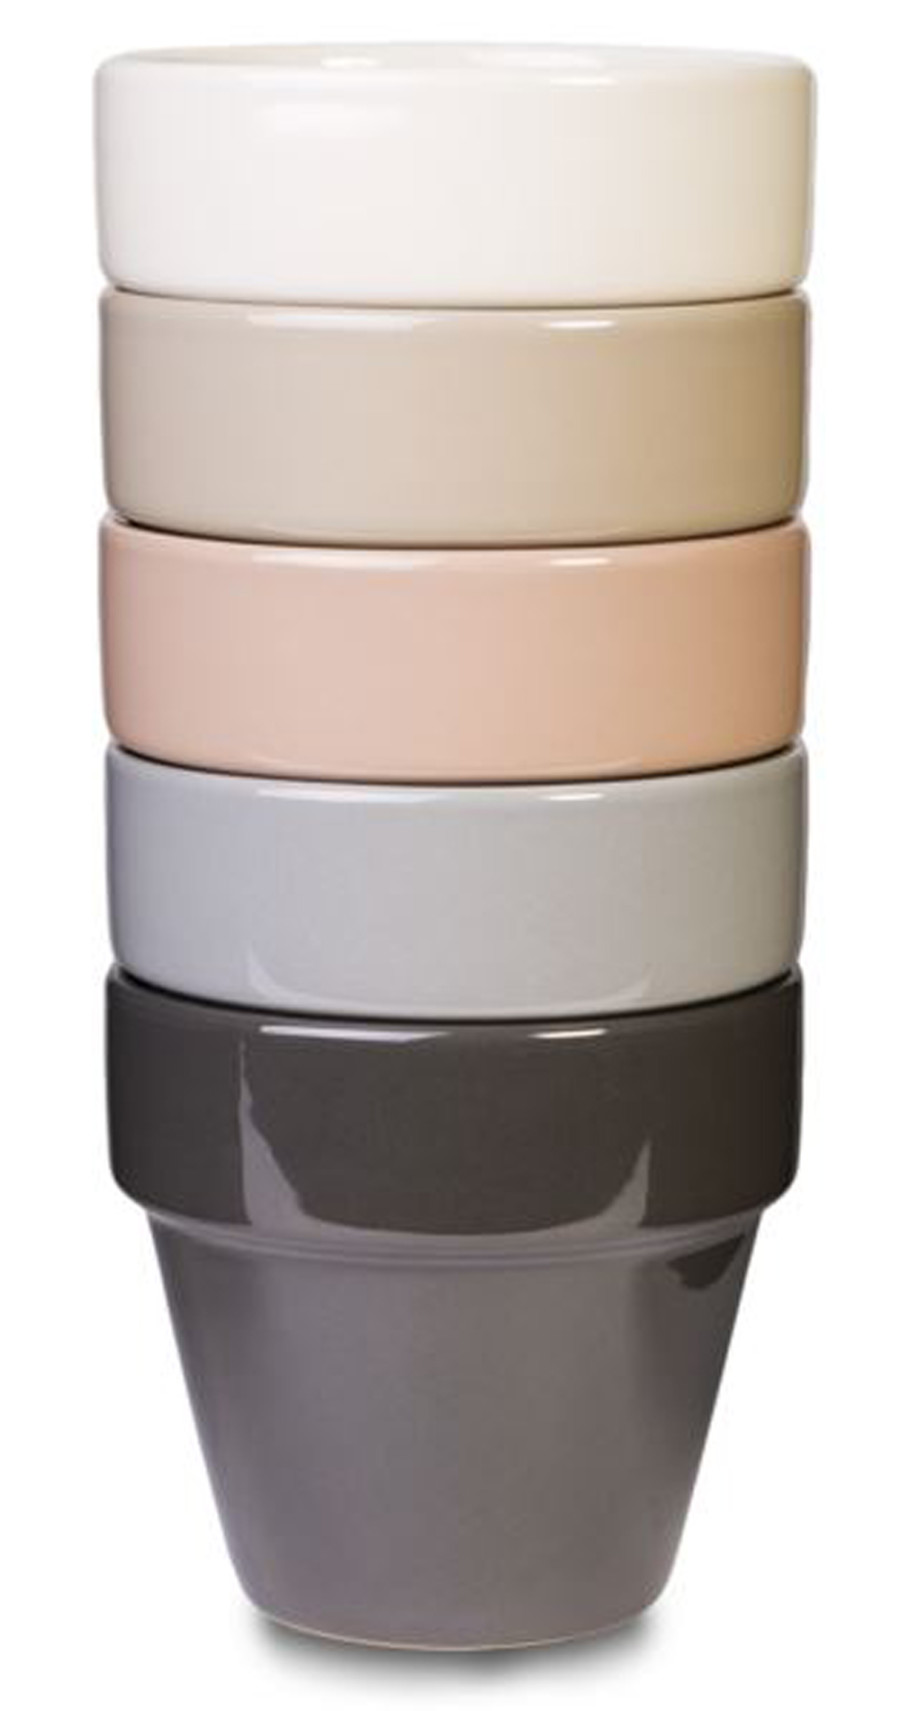 Pennington Electric Pot Assortment Modern Classics Oxford Tan, Warm Taupe, Wild Dove, Gargoyle, Bone White 6ea/7.25 in